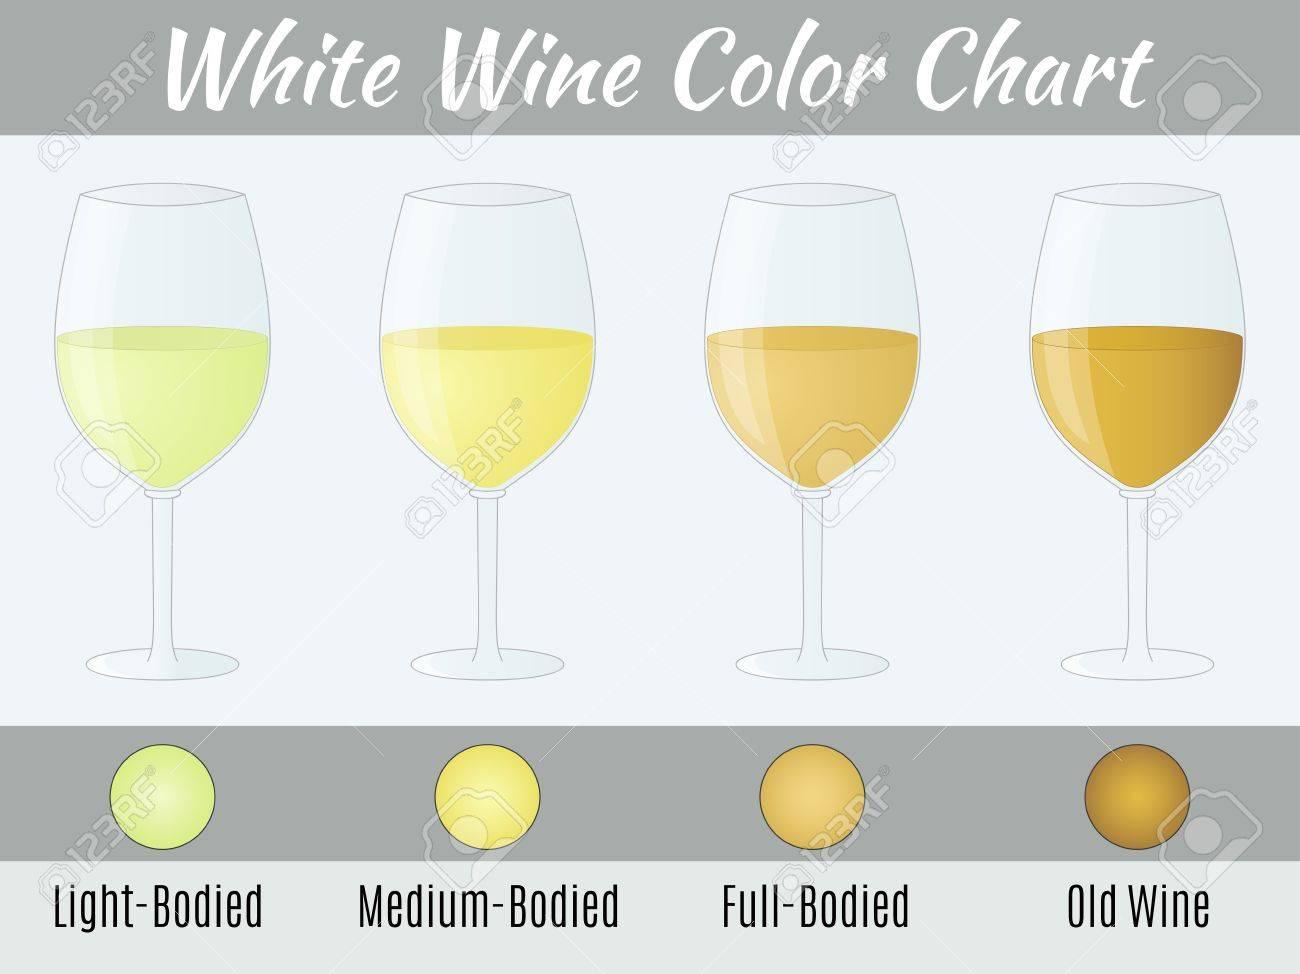 White wine color chart. Hand drawn wine glasses. - 61427888